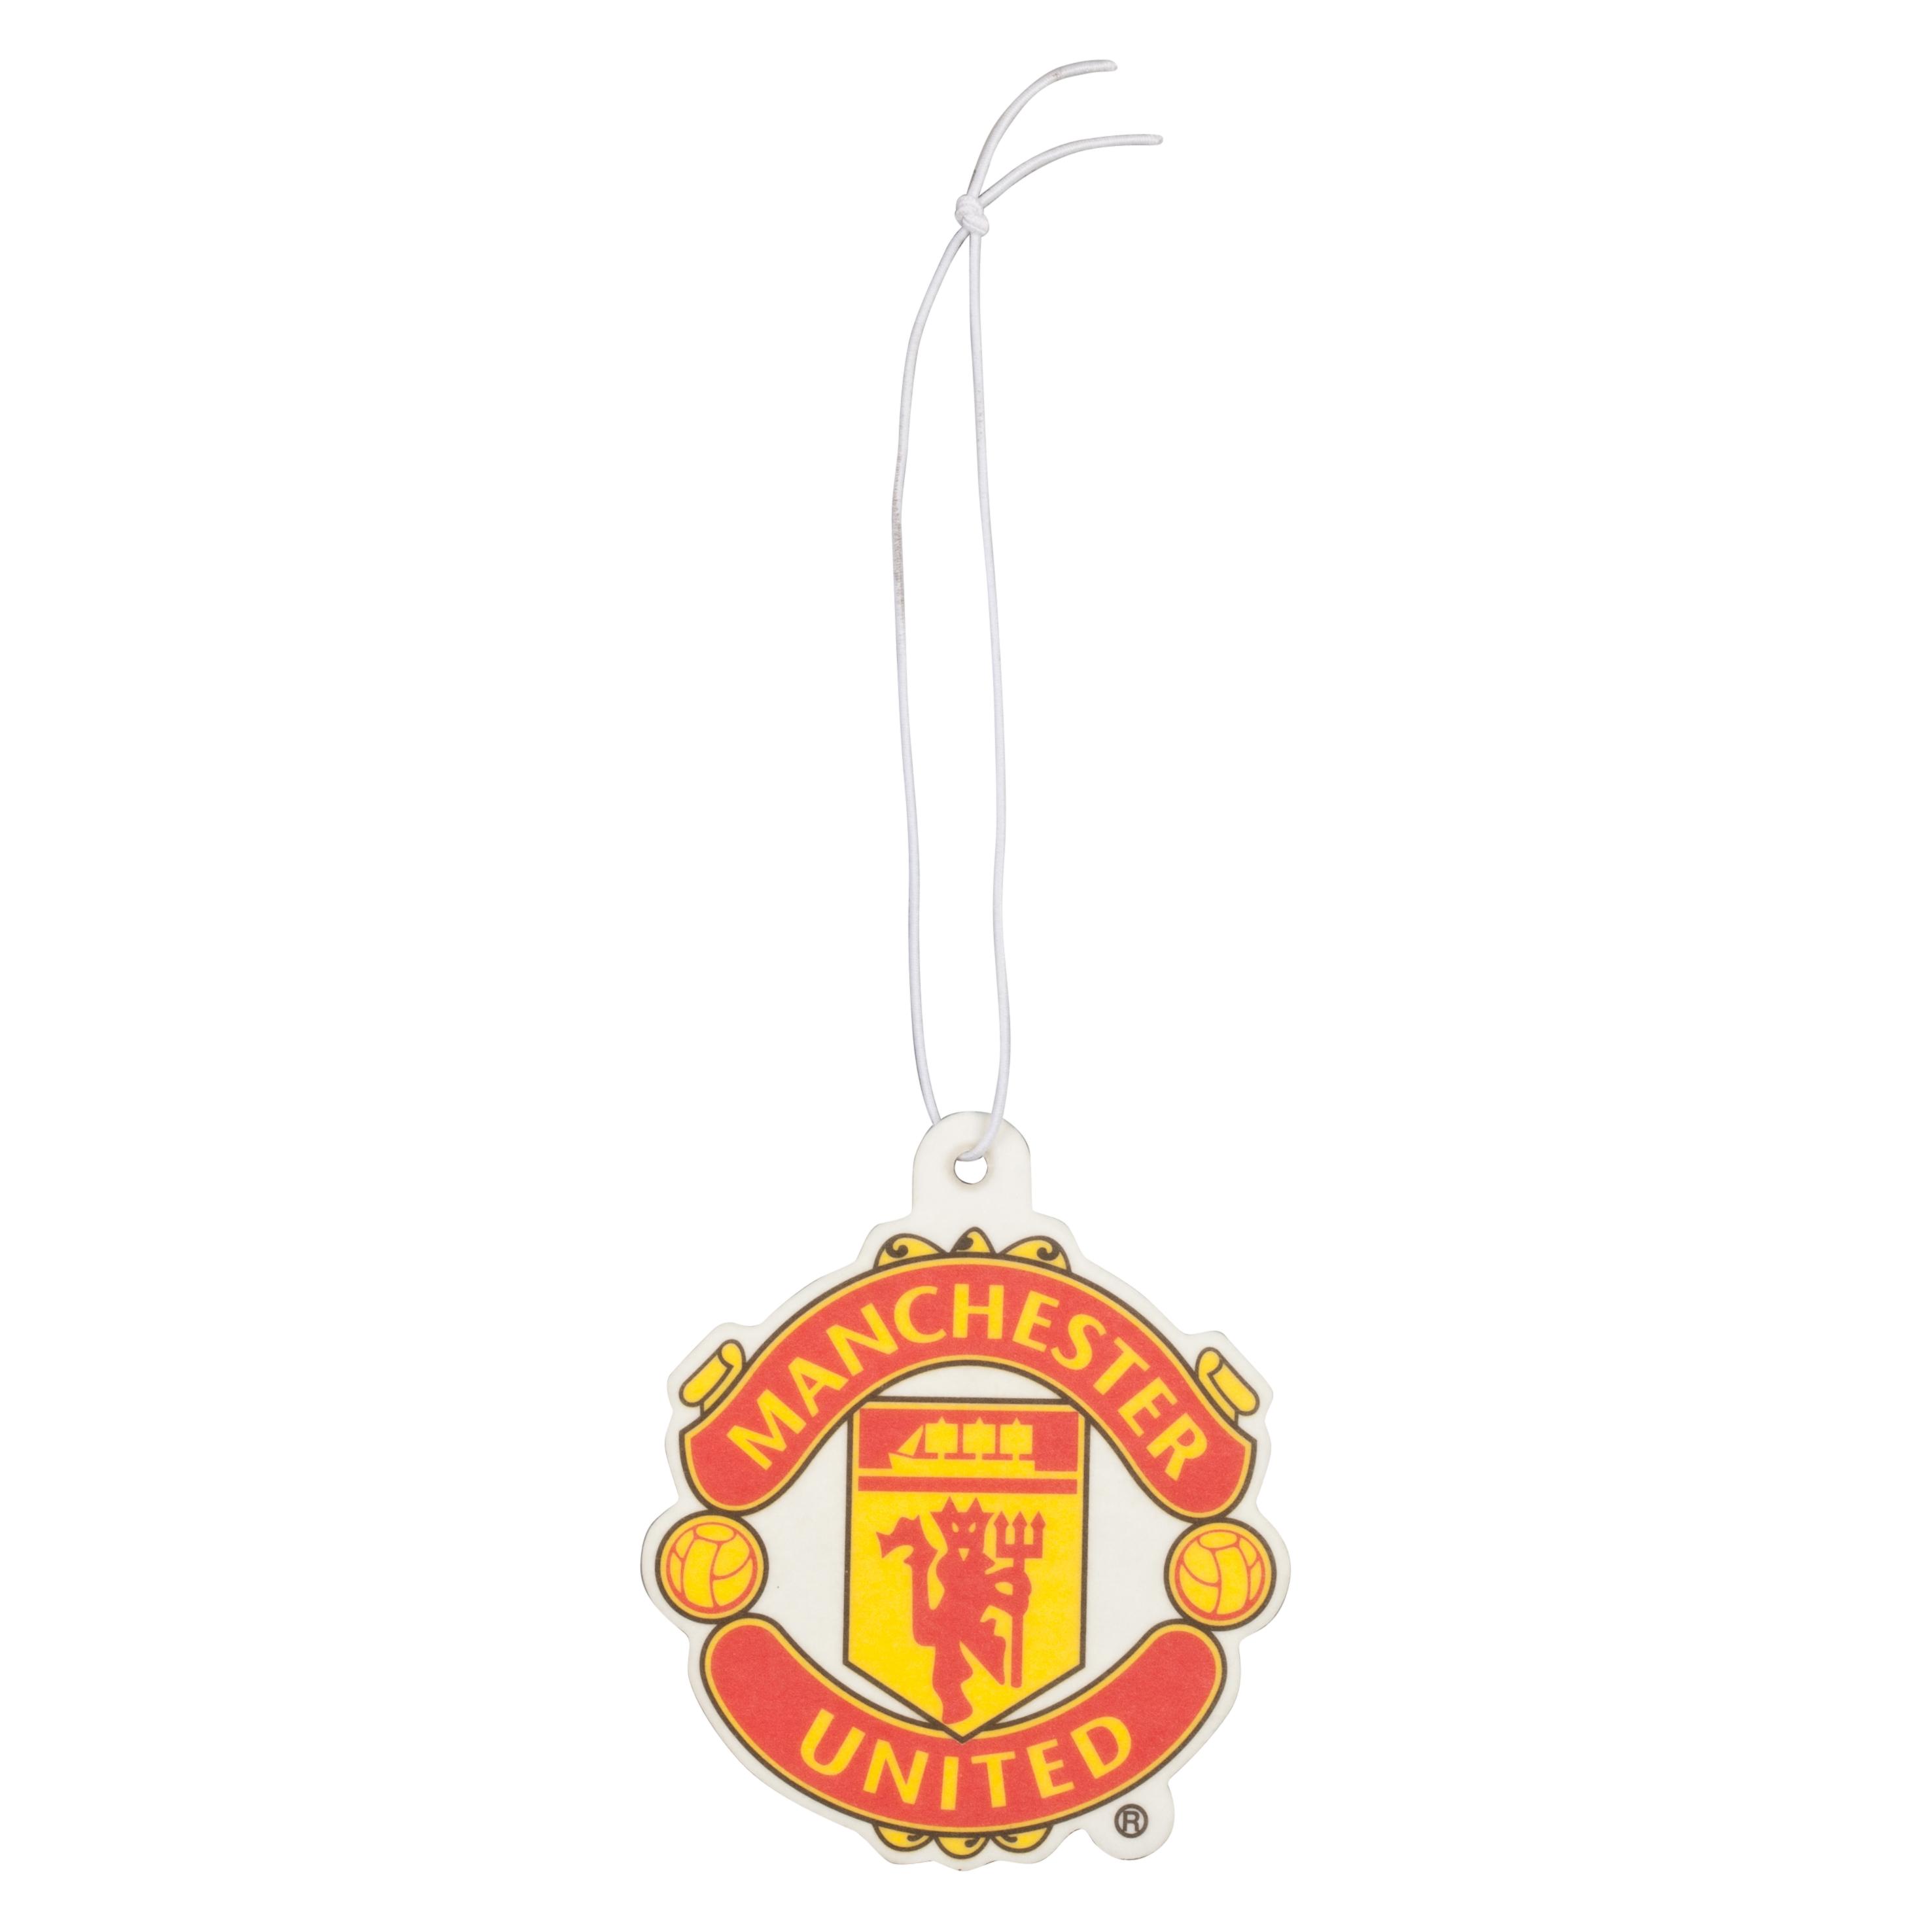 Manchester United Crest Car Air Freshener